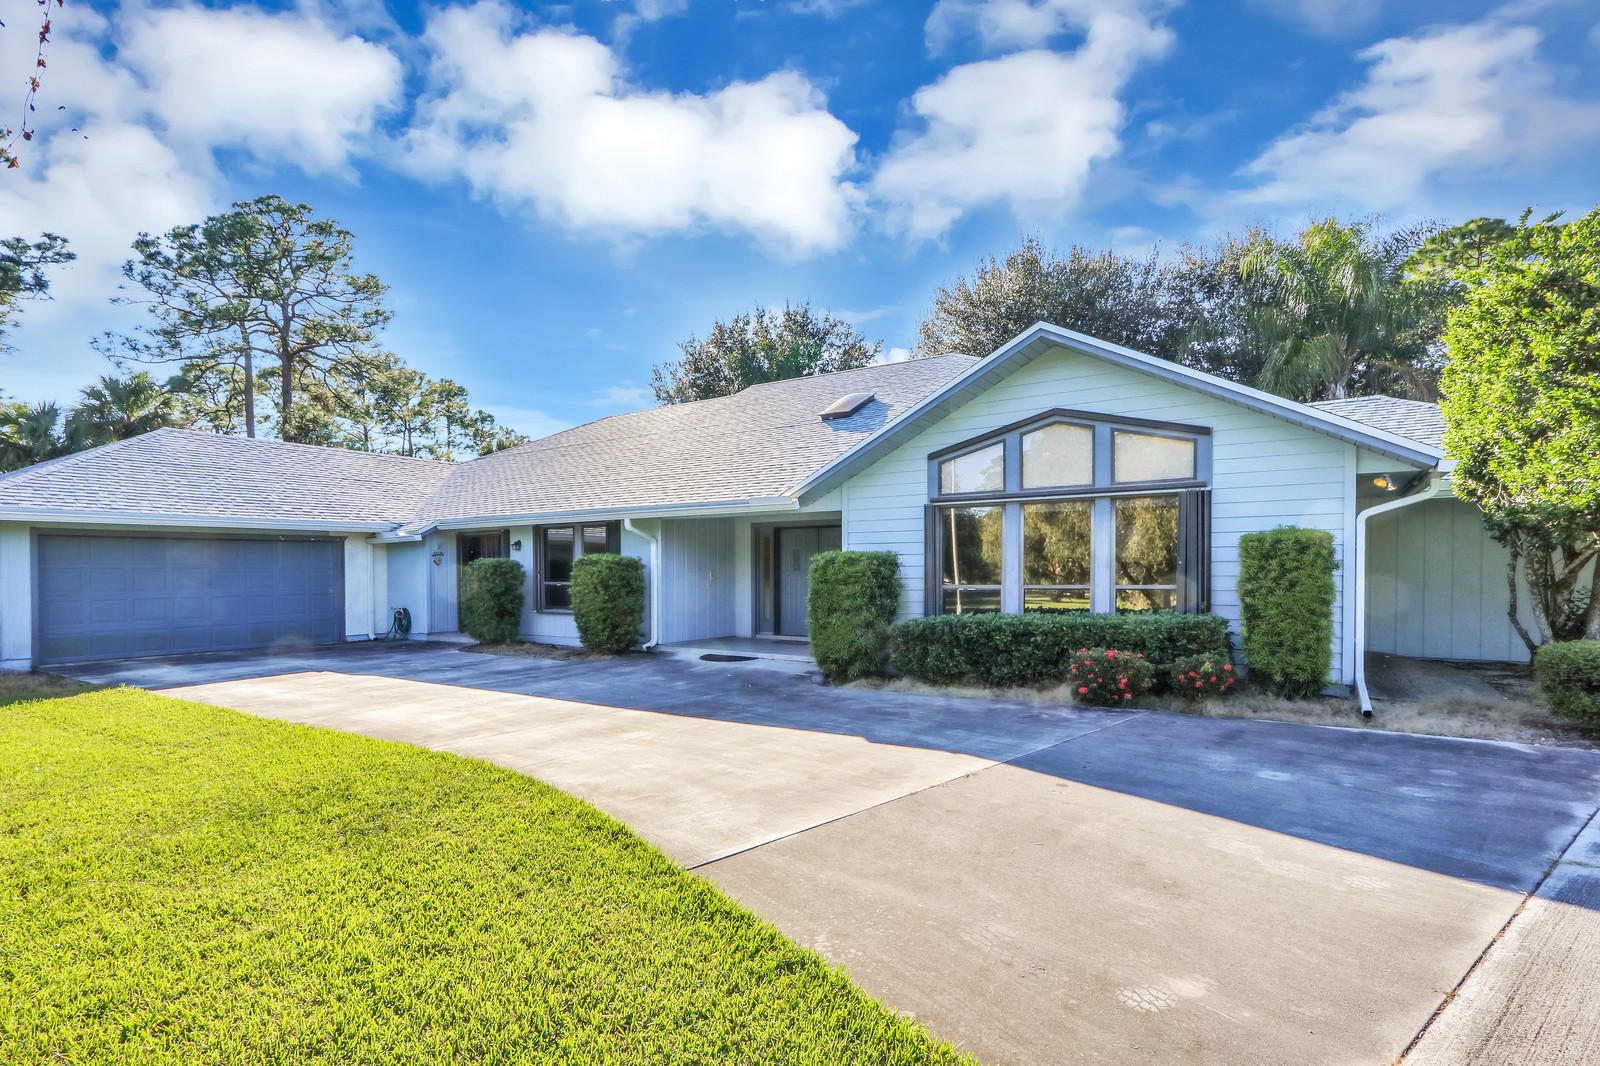 5902 Mistletoe Lane, Palm City, Florida 34990, 4 Bedrooms Bedrooms, ,3 BathroomsBathrooms,Single Family,For Sale,PALM CITY FARMS,Mistletoe,RX-10584491